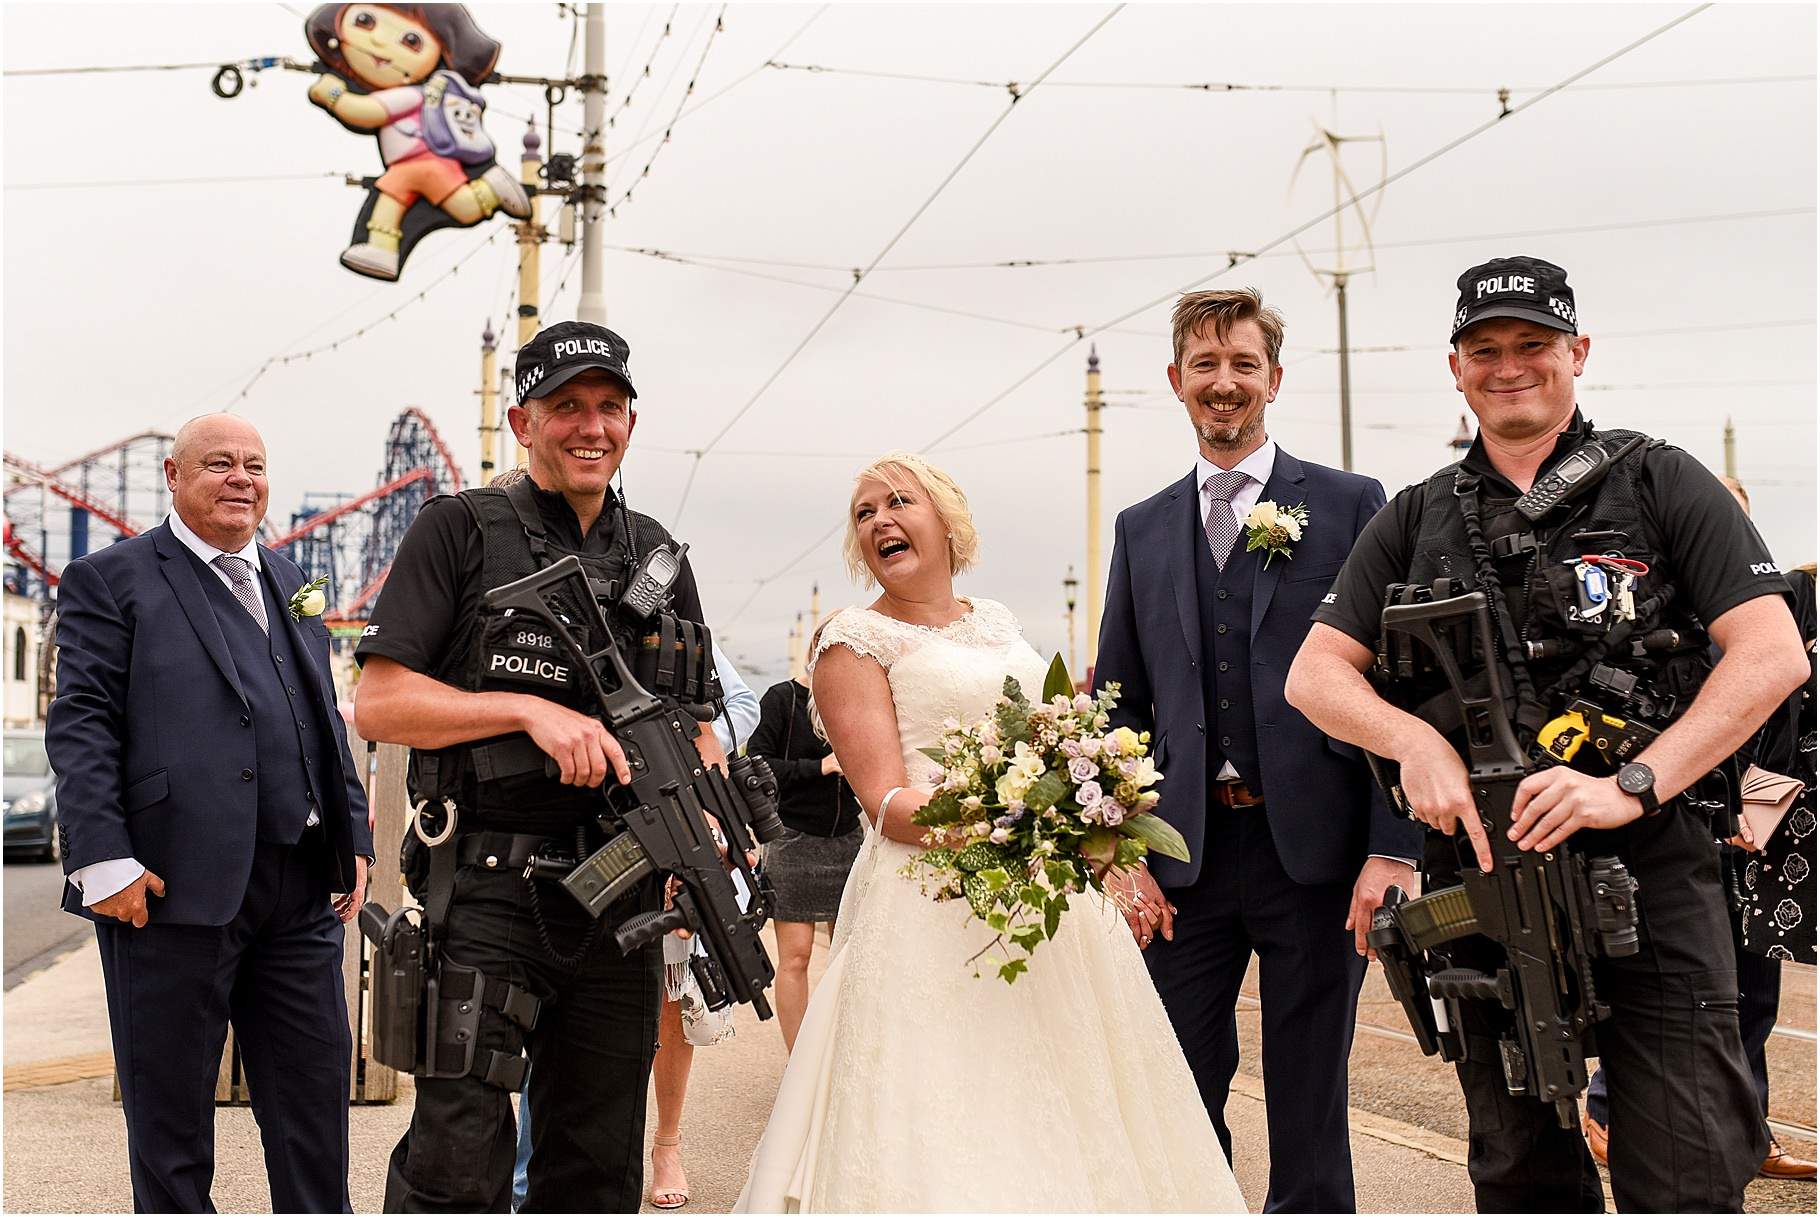 dan-wootton-photography-2017-weddings-111.jpg